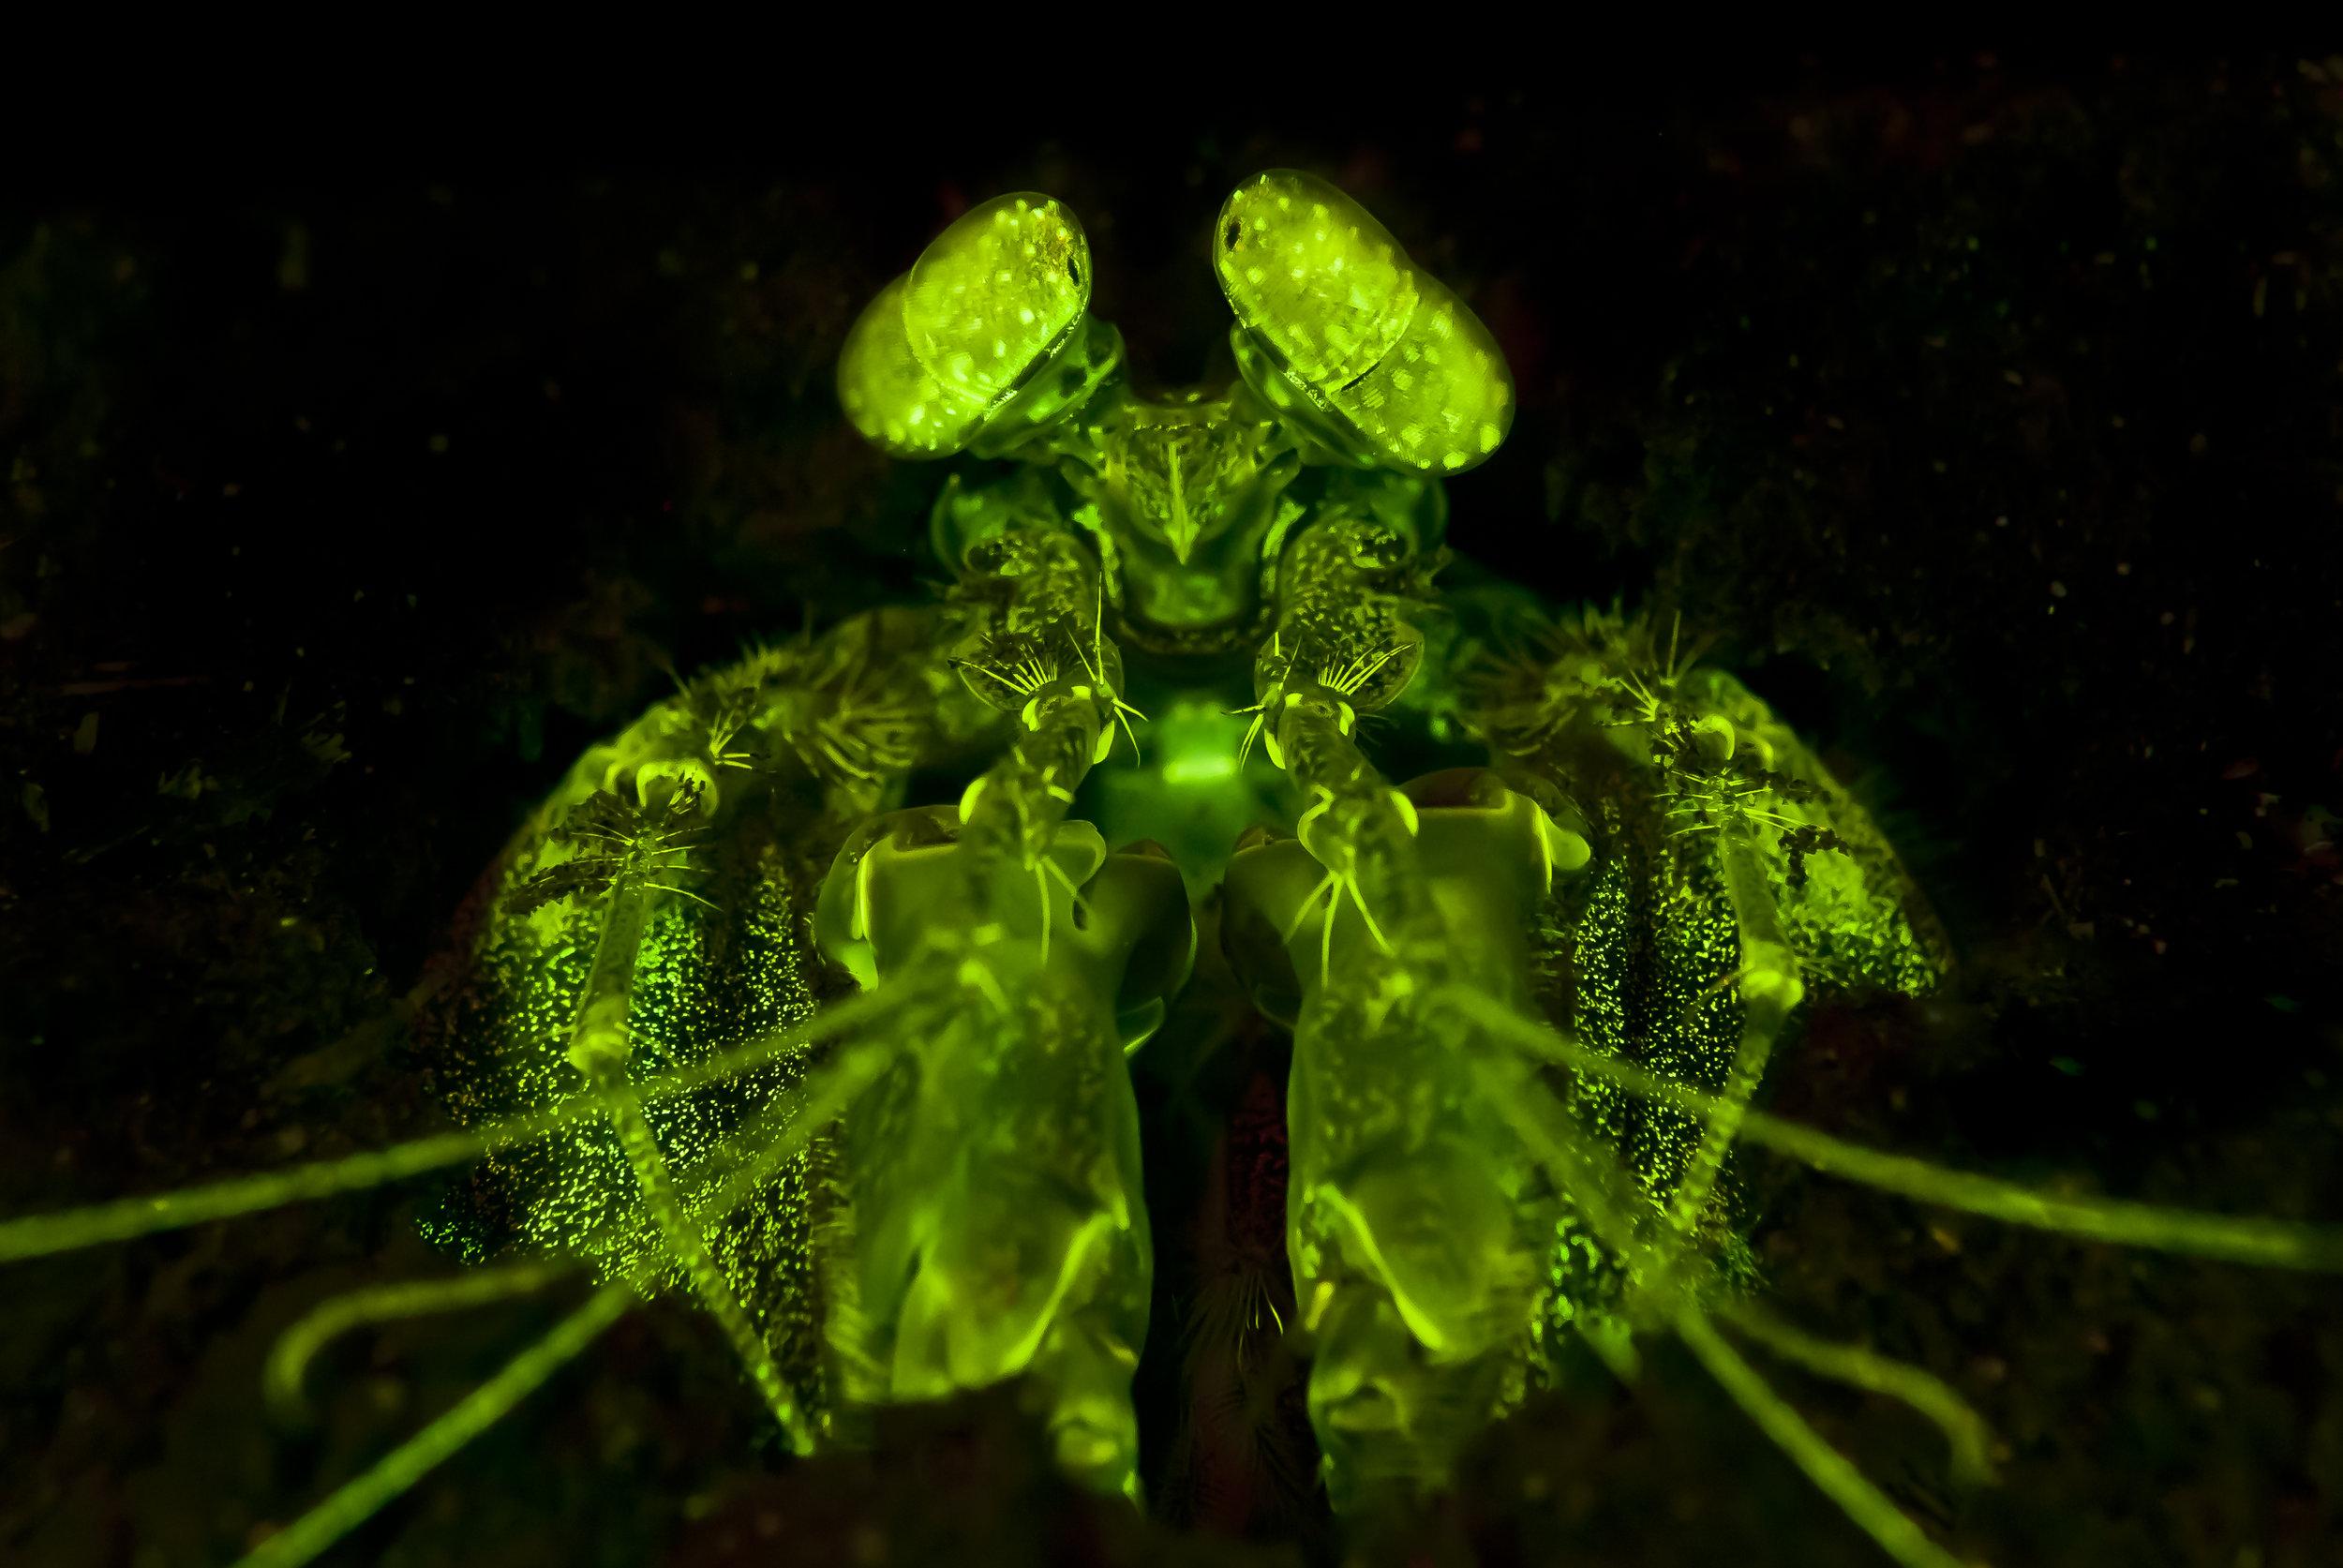 Lisa's Mantis Shrimp Fluorescence (Lysiosquillina lisa) credit: alex tyrrell / coral reef image bank